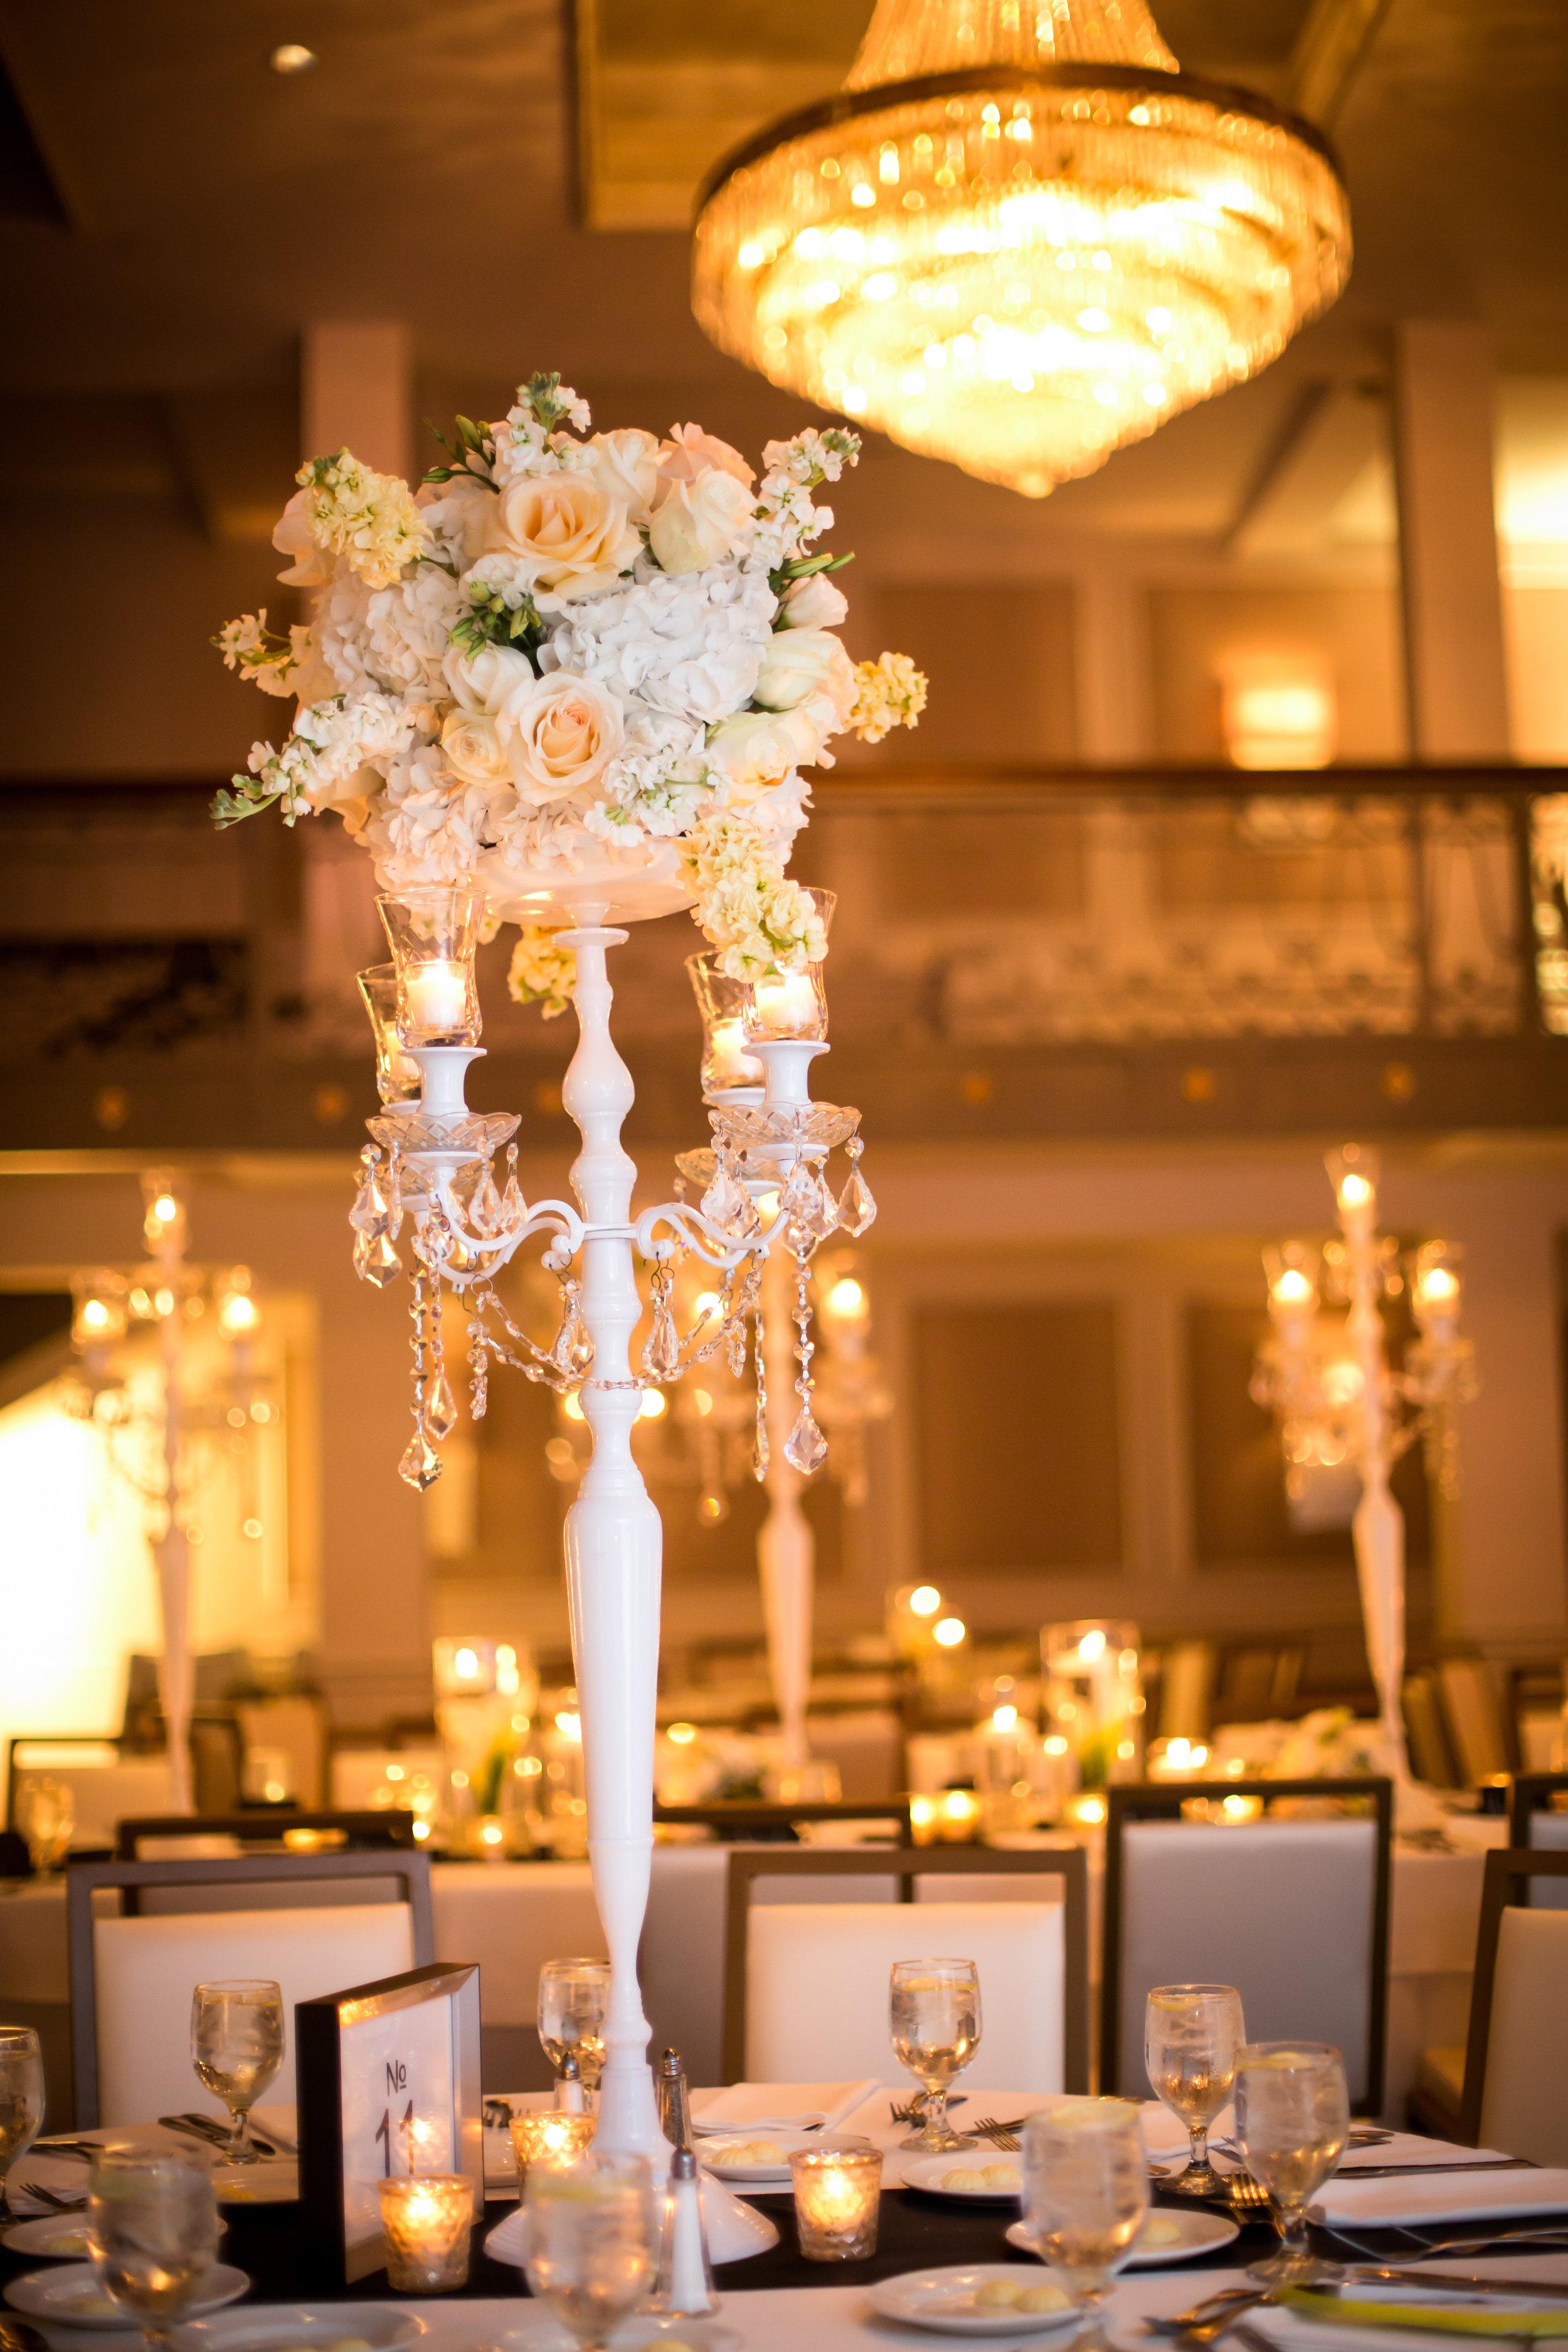 Marble_Falls_Horseshoe_Bay_Photographer_Torres_Wedding_40.jpg